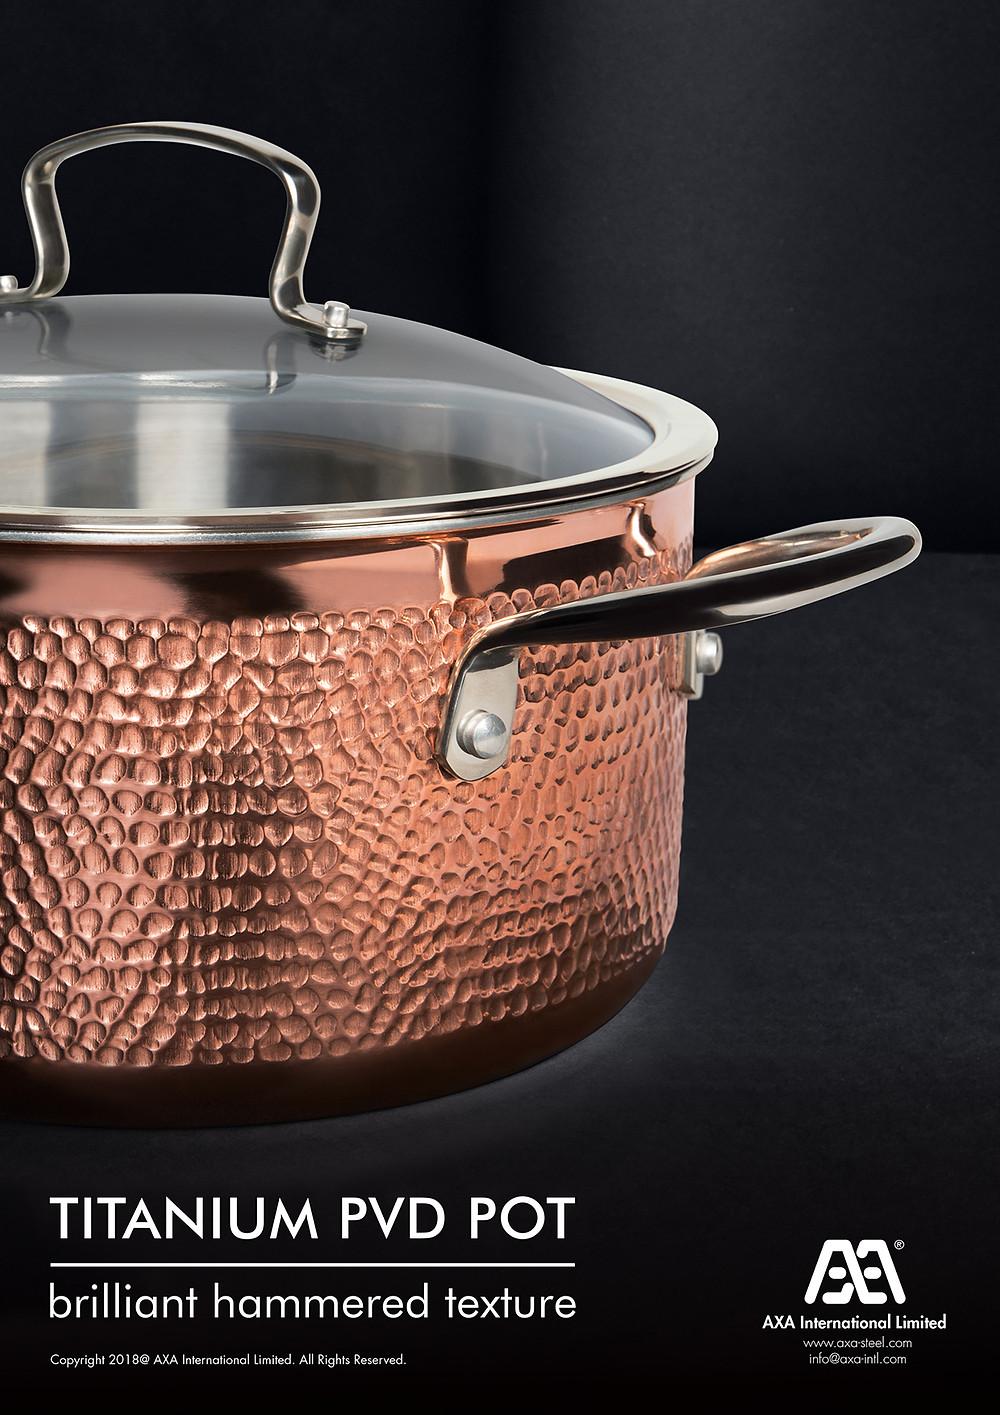 Titanium PVD Pot